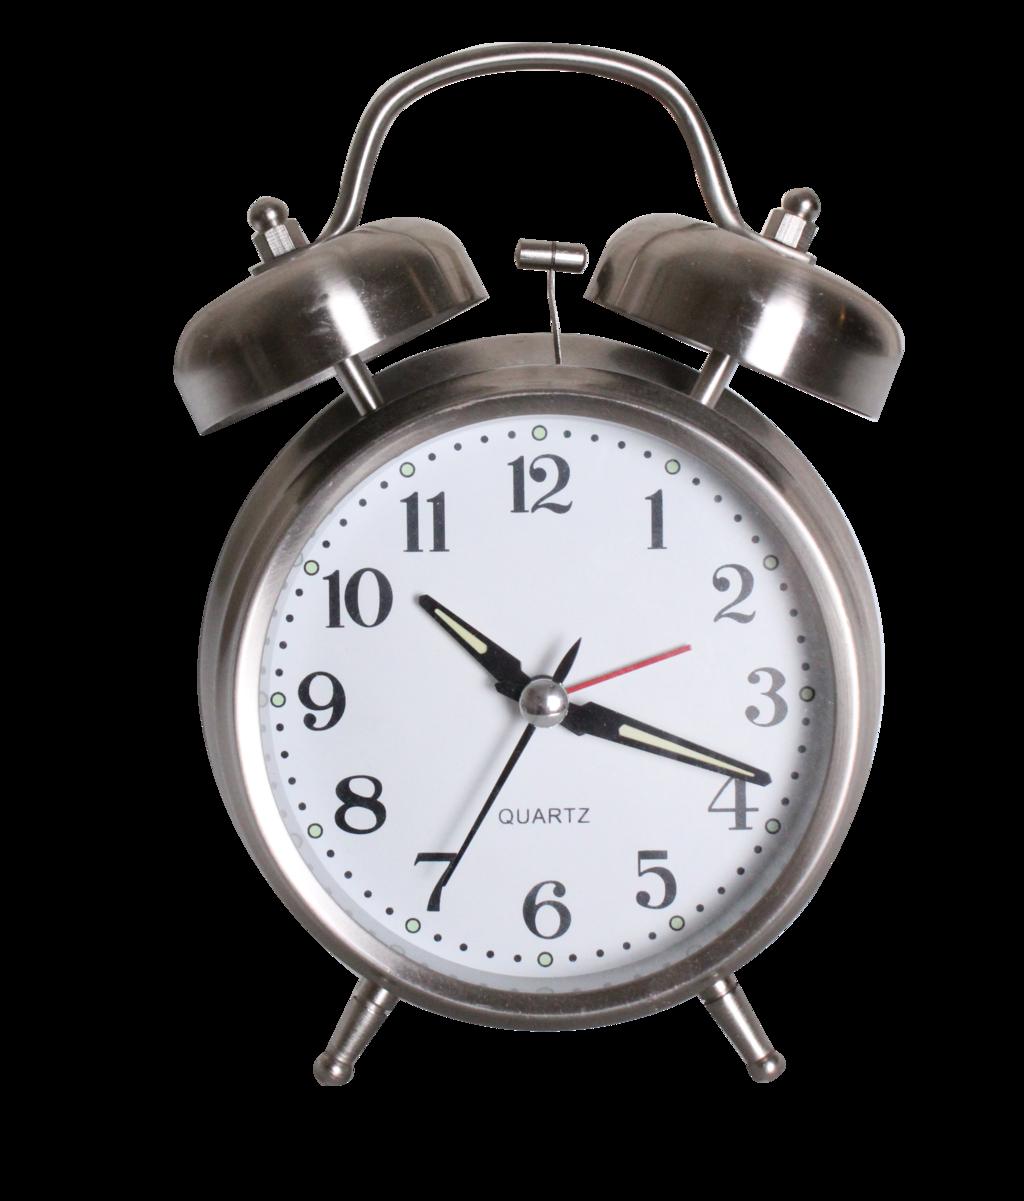 Clock PNG Transparent Images.